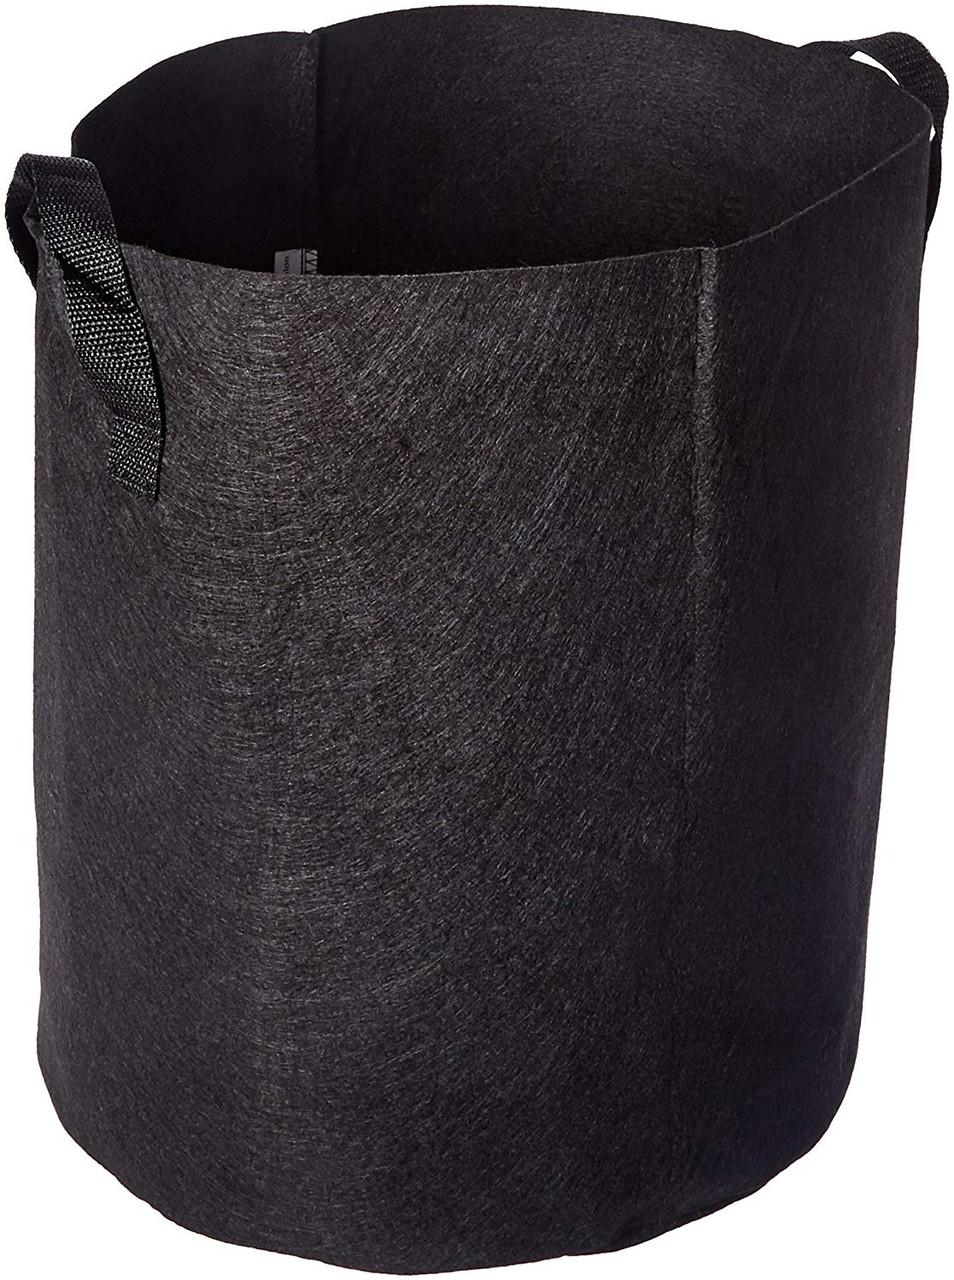 Viagrow Fabric Pot w/Handles Black | 7 Gal - 5 Pack